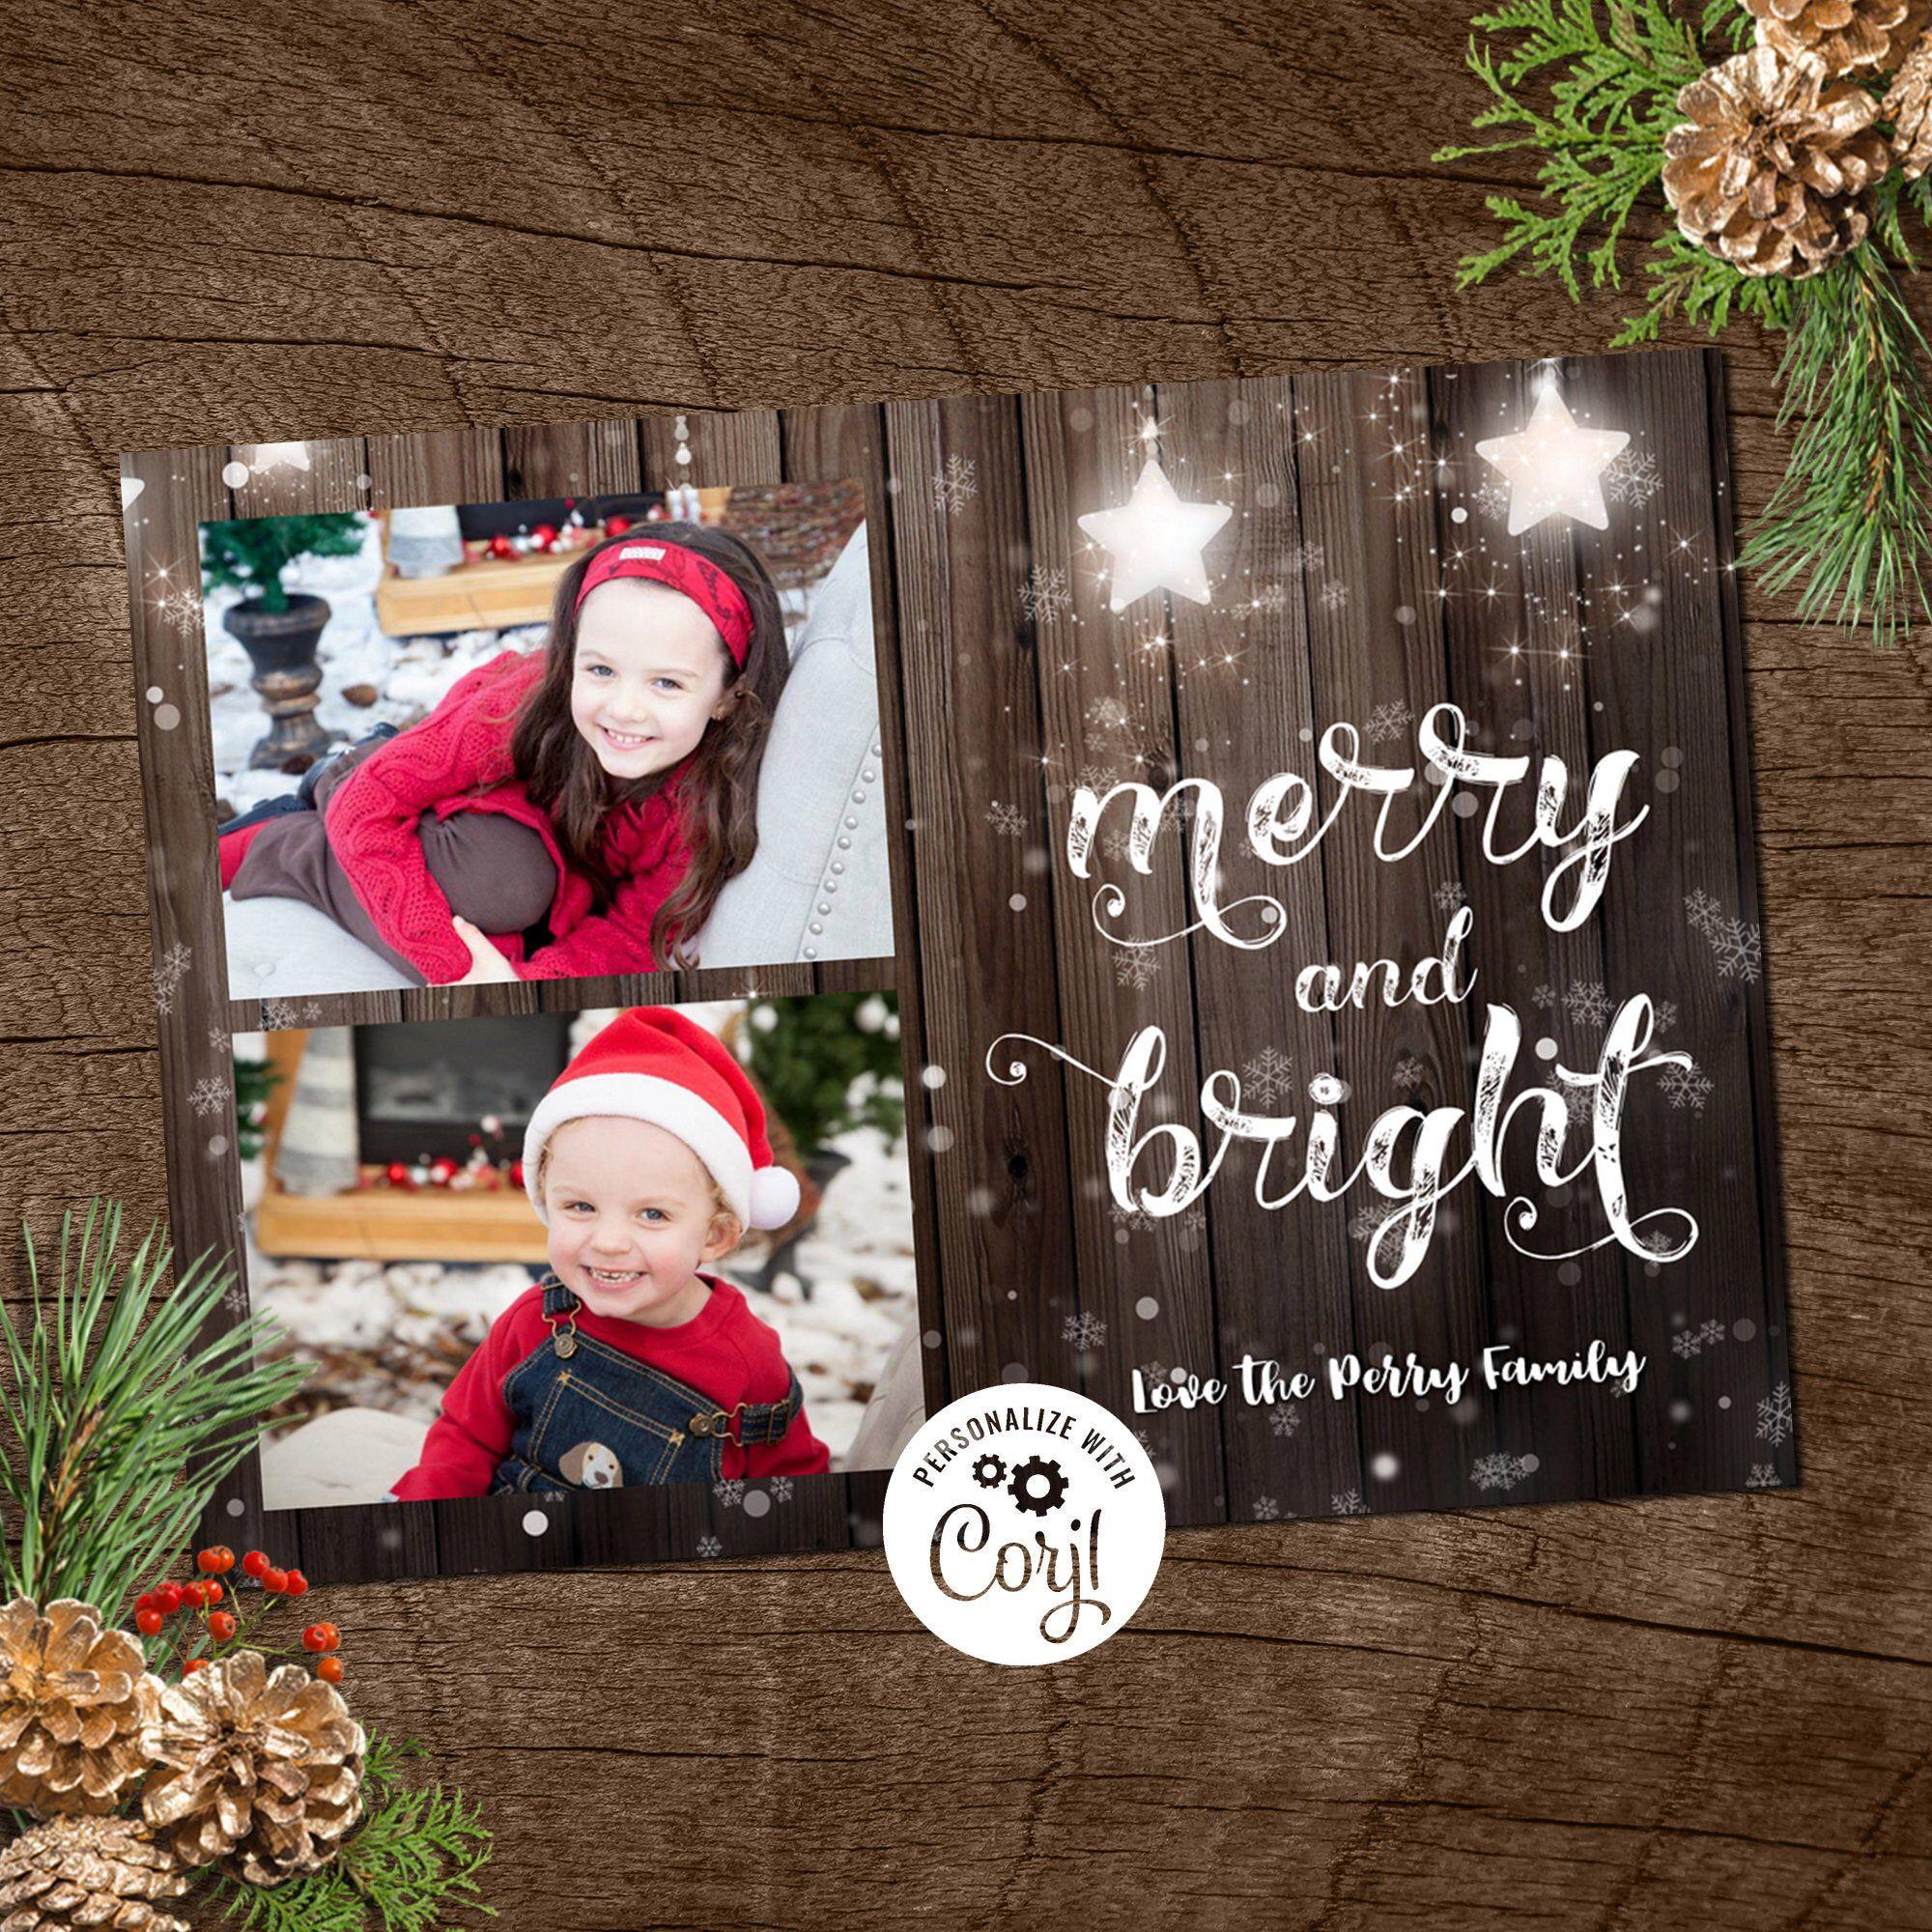 Joyful Greetings Card Holiday Family Card Photo Christmas Card Family Christmas Card Holiday Photo Card Digital Christmas Card Wood Family Christmas Cards Creative Christmas Cards Christmas Photo Cards